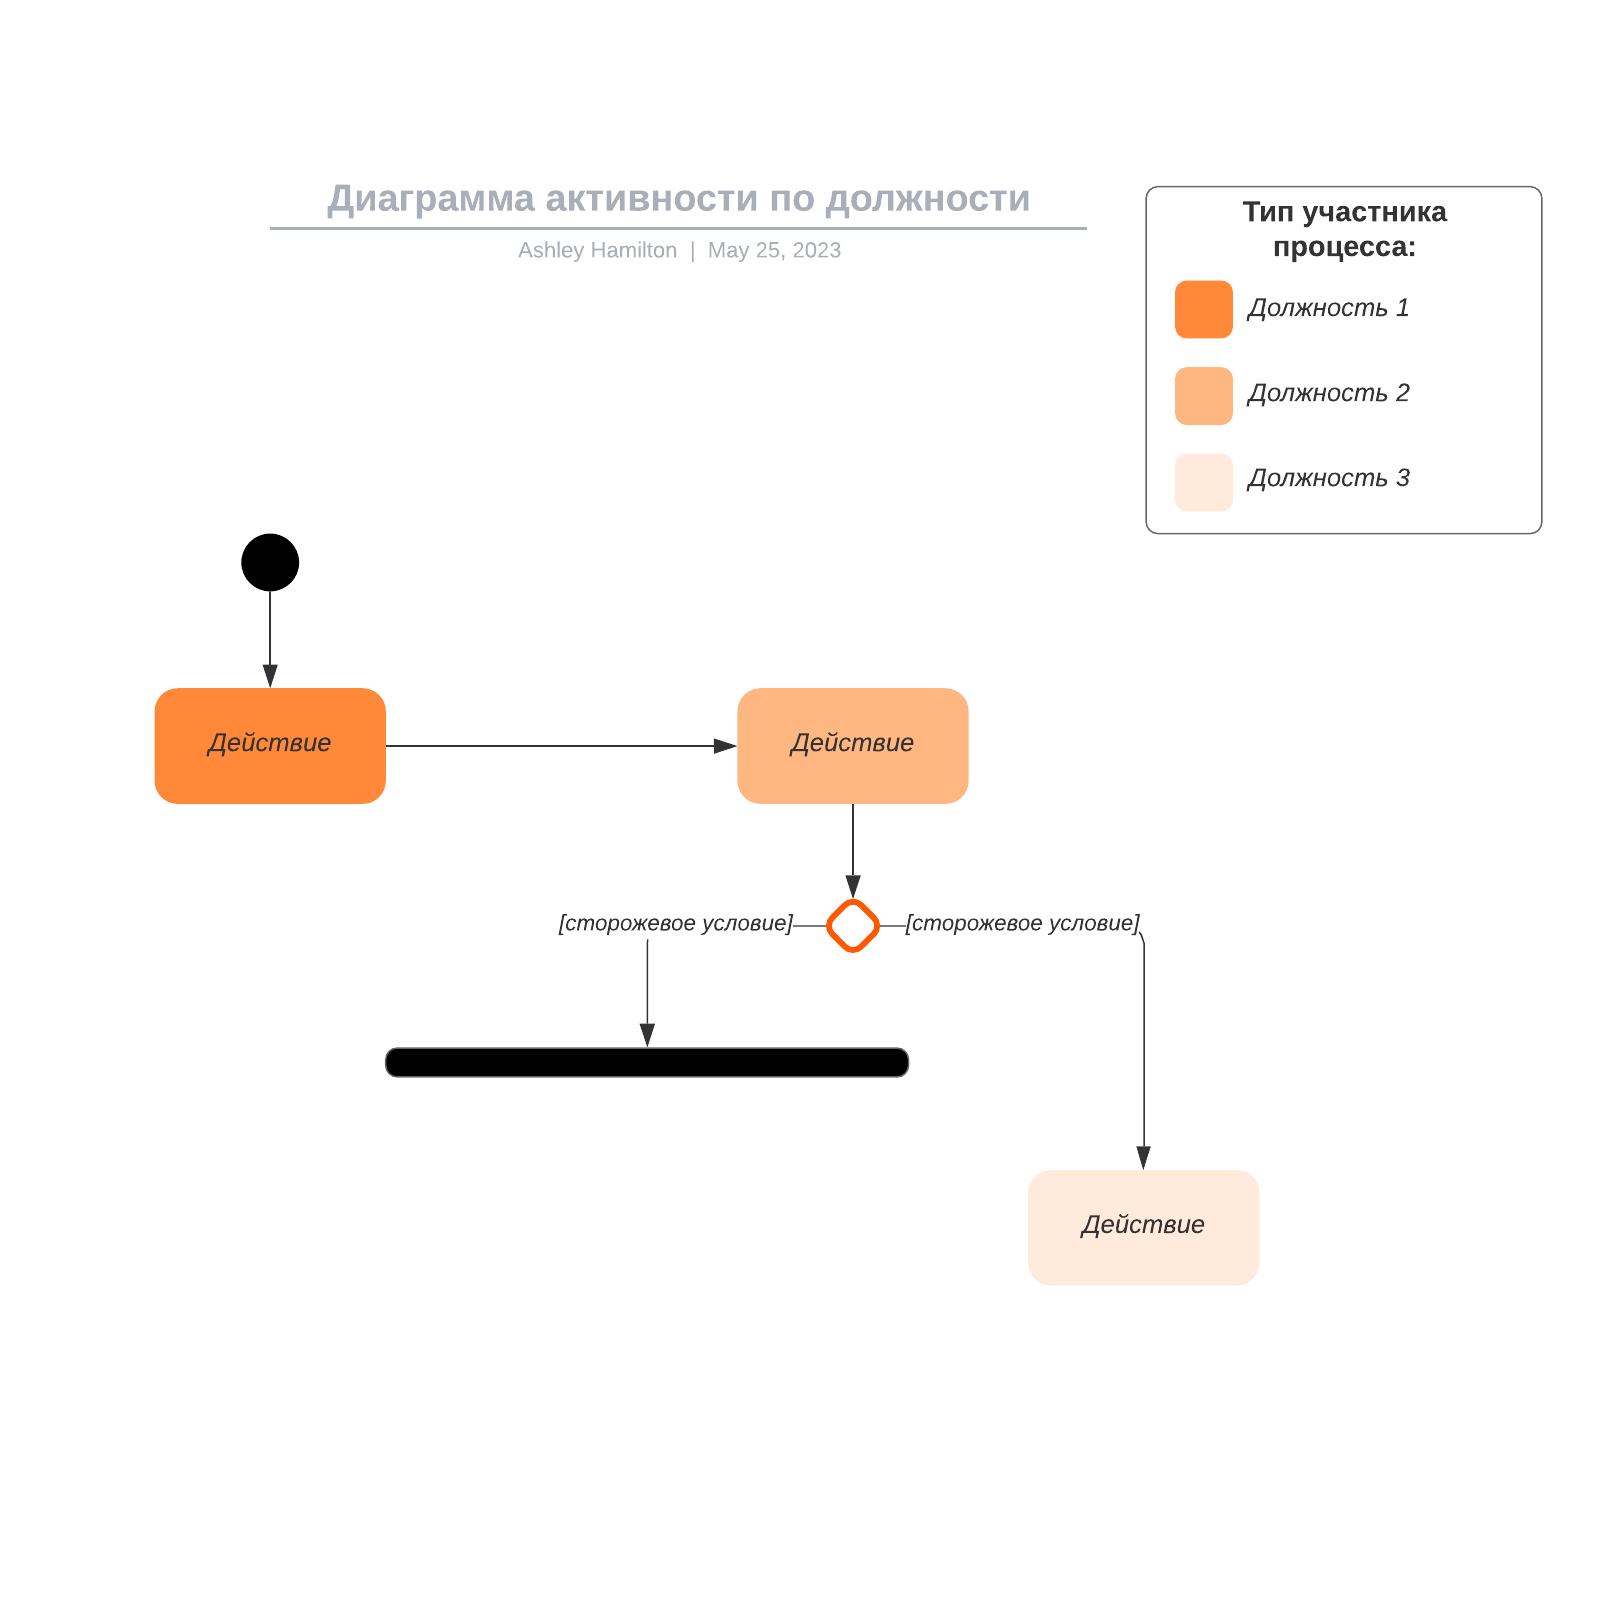 Диаграмма активности по должности